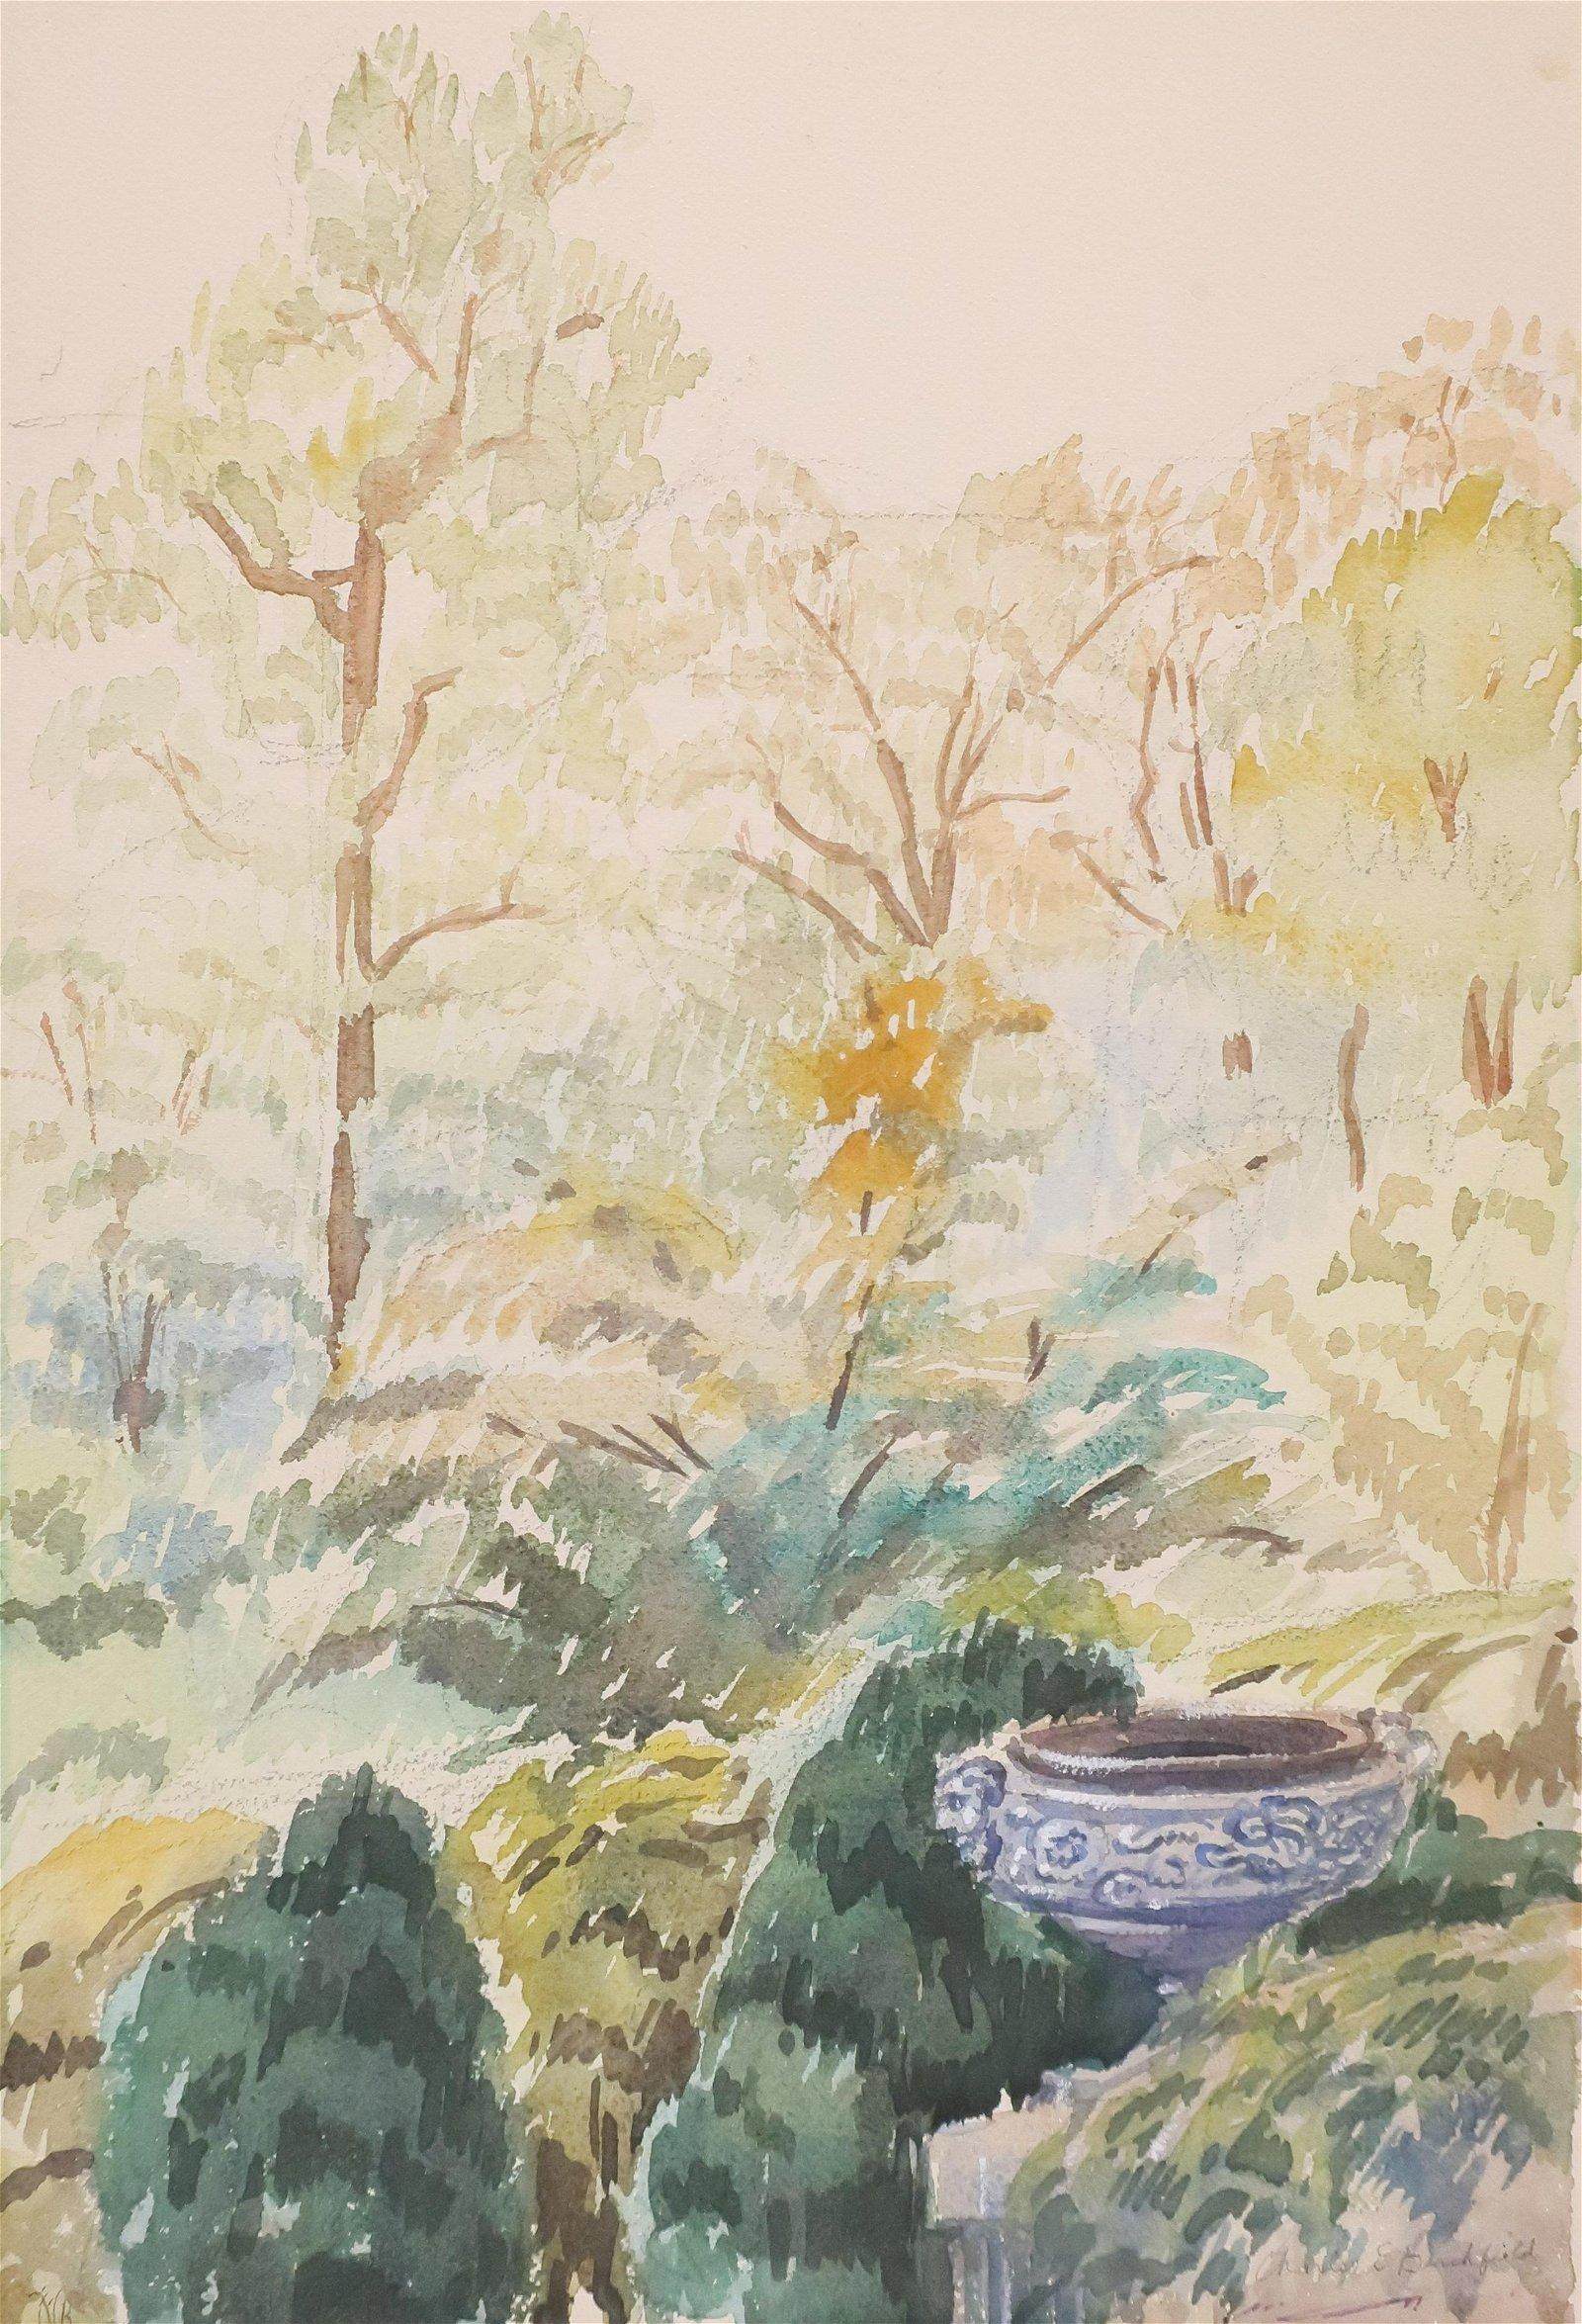 Charles Burchfield - Urn in Landscape W/C